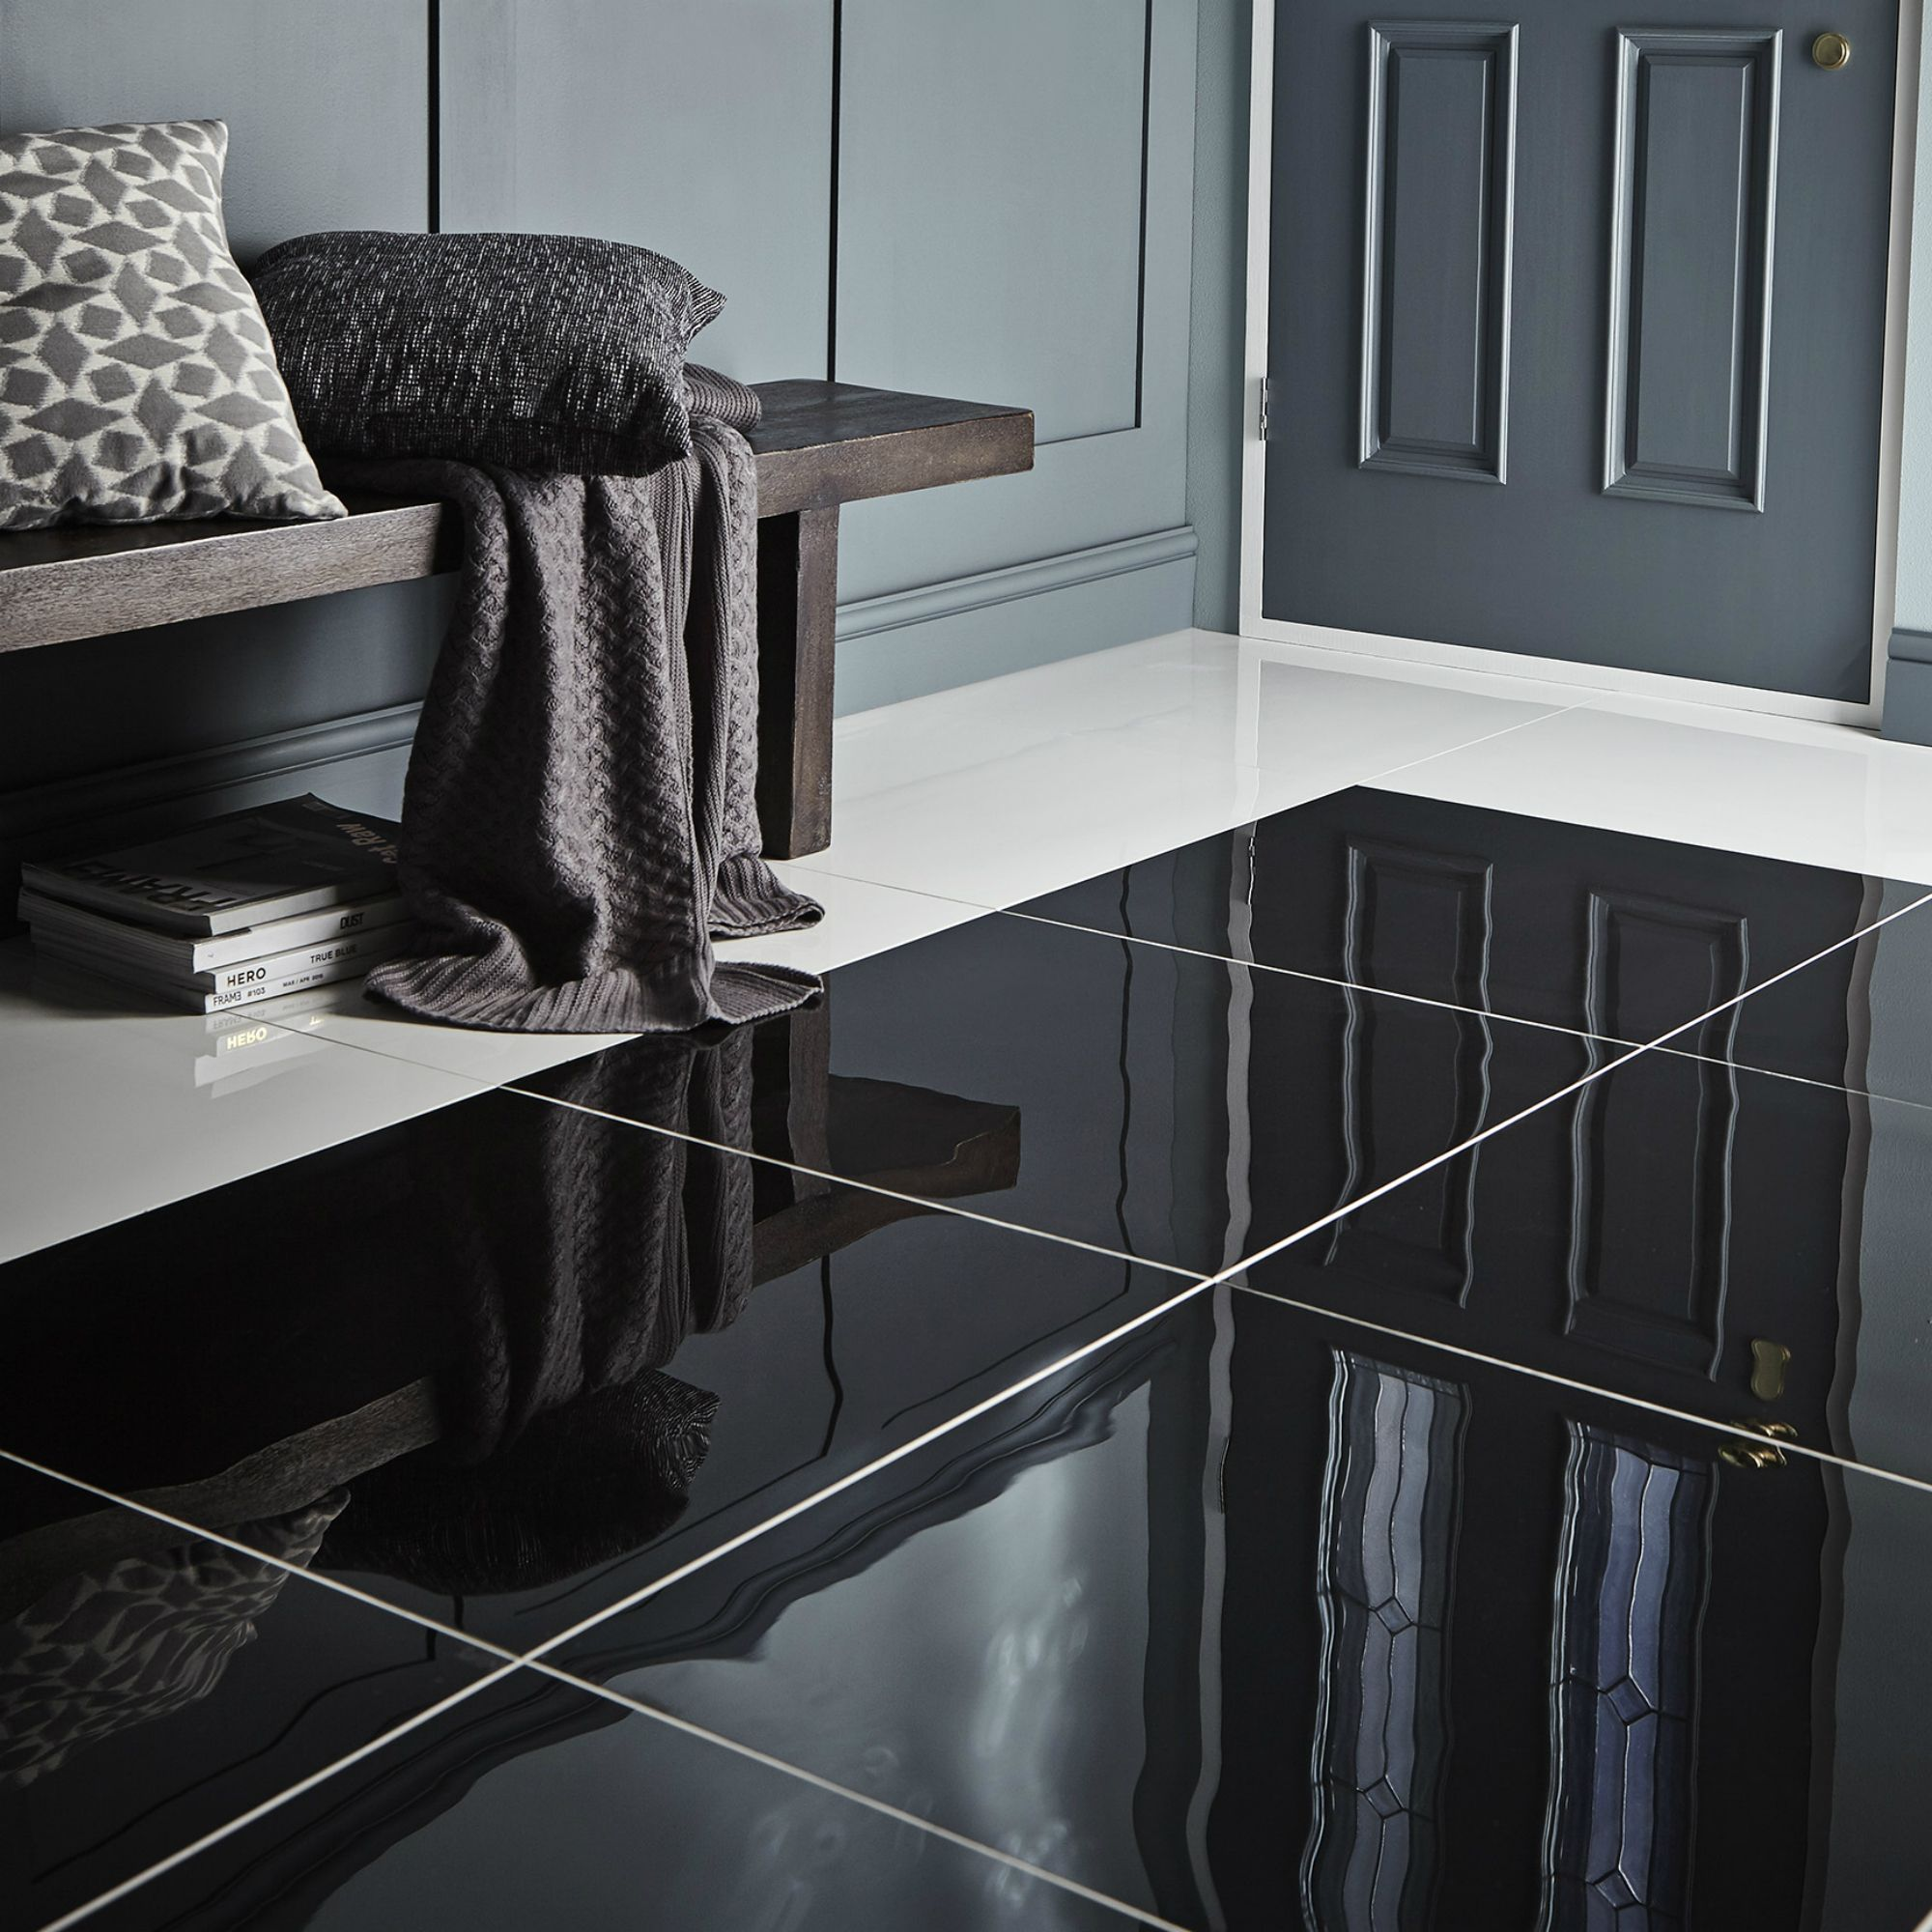 Diy at bq livourne black polished floor tile pack of 3 l600mm w dailygadgetfo Gallery